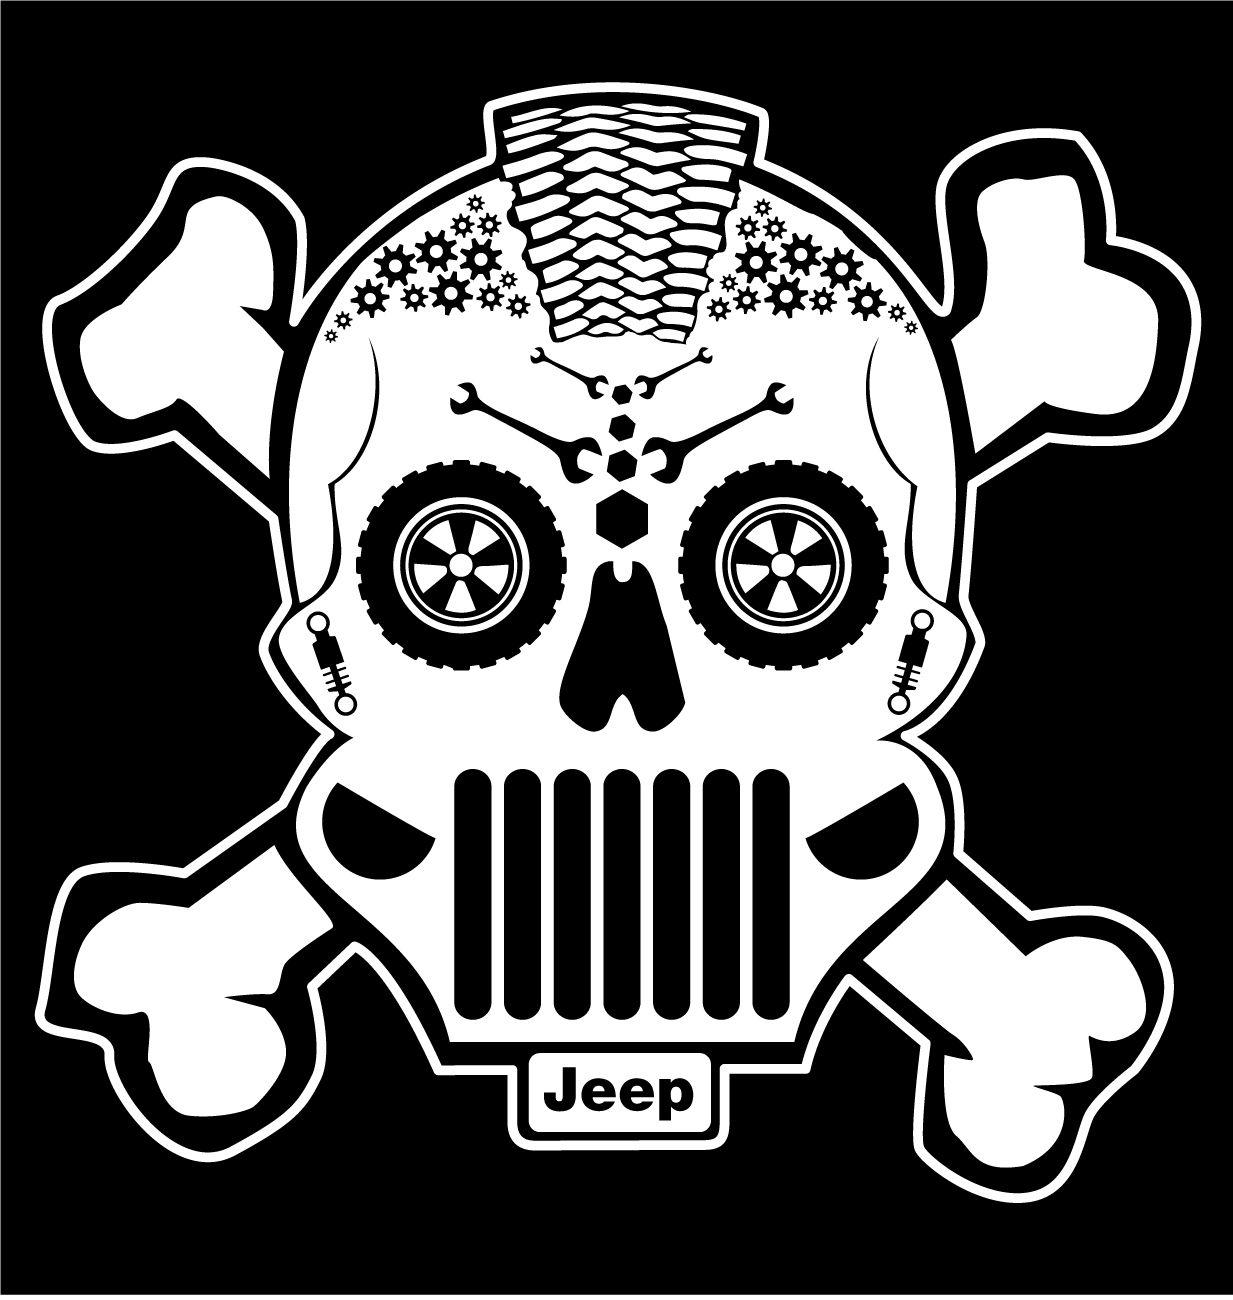 Pin By Elisa Fortes On Sugar Skull Designs Jeep Life Decal Sugar Skull Design Jeep Decals [ 1300 x 1233 Pixel ]